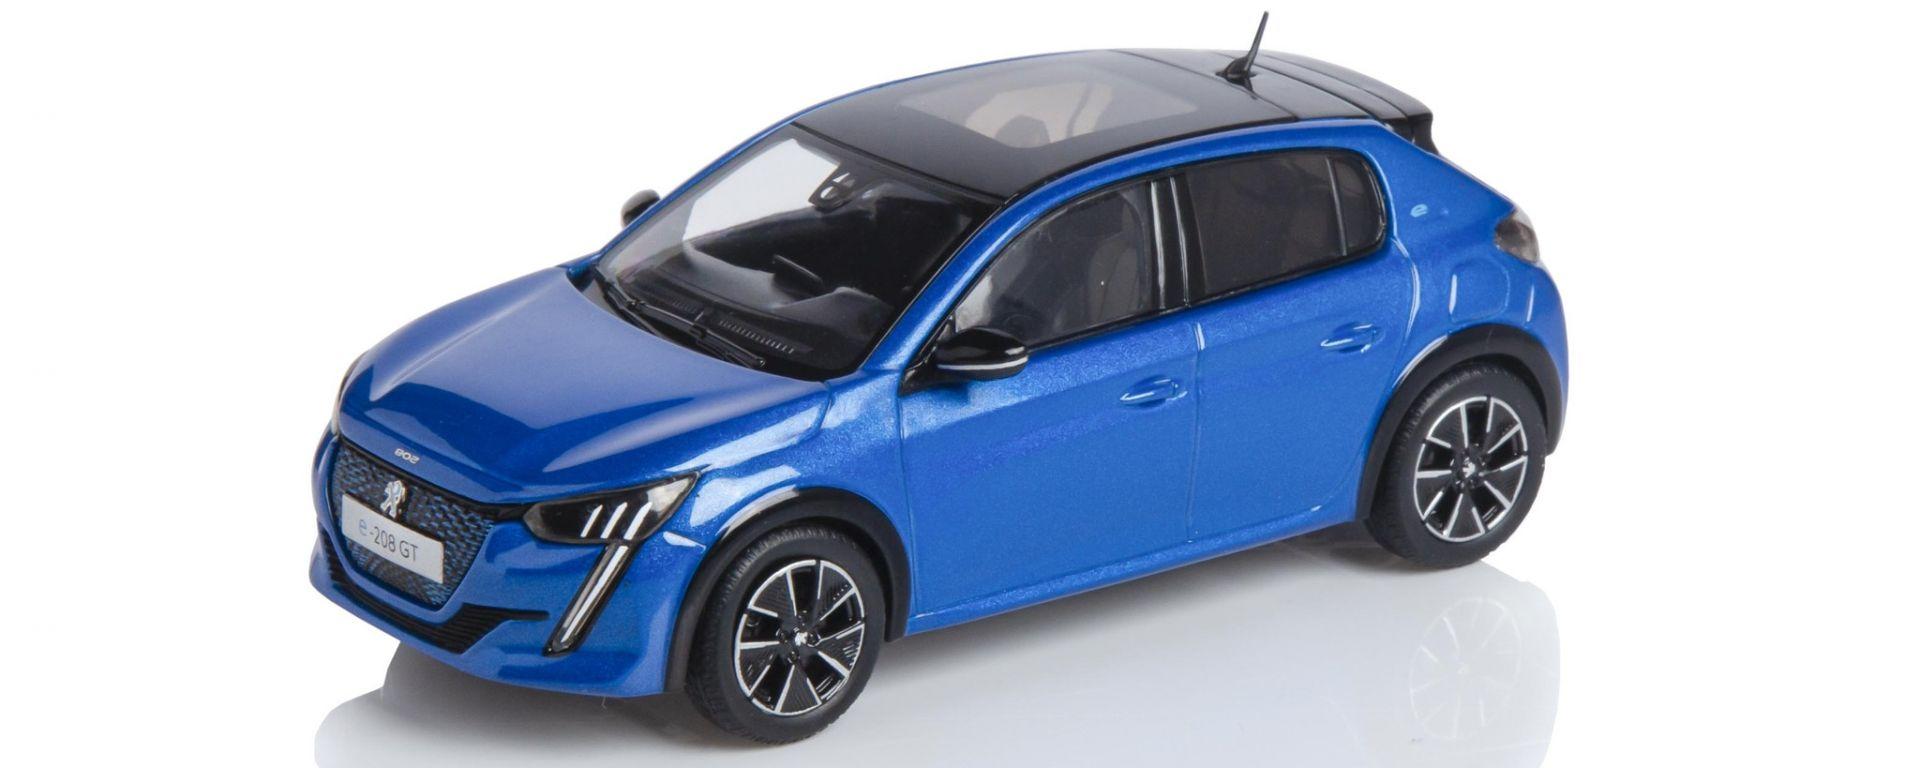 Modellino Peugeot e-208 Blu Vertigo